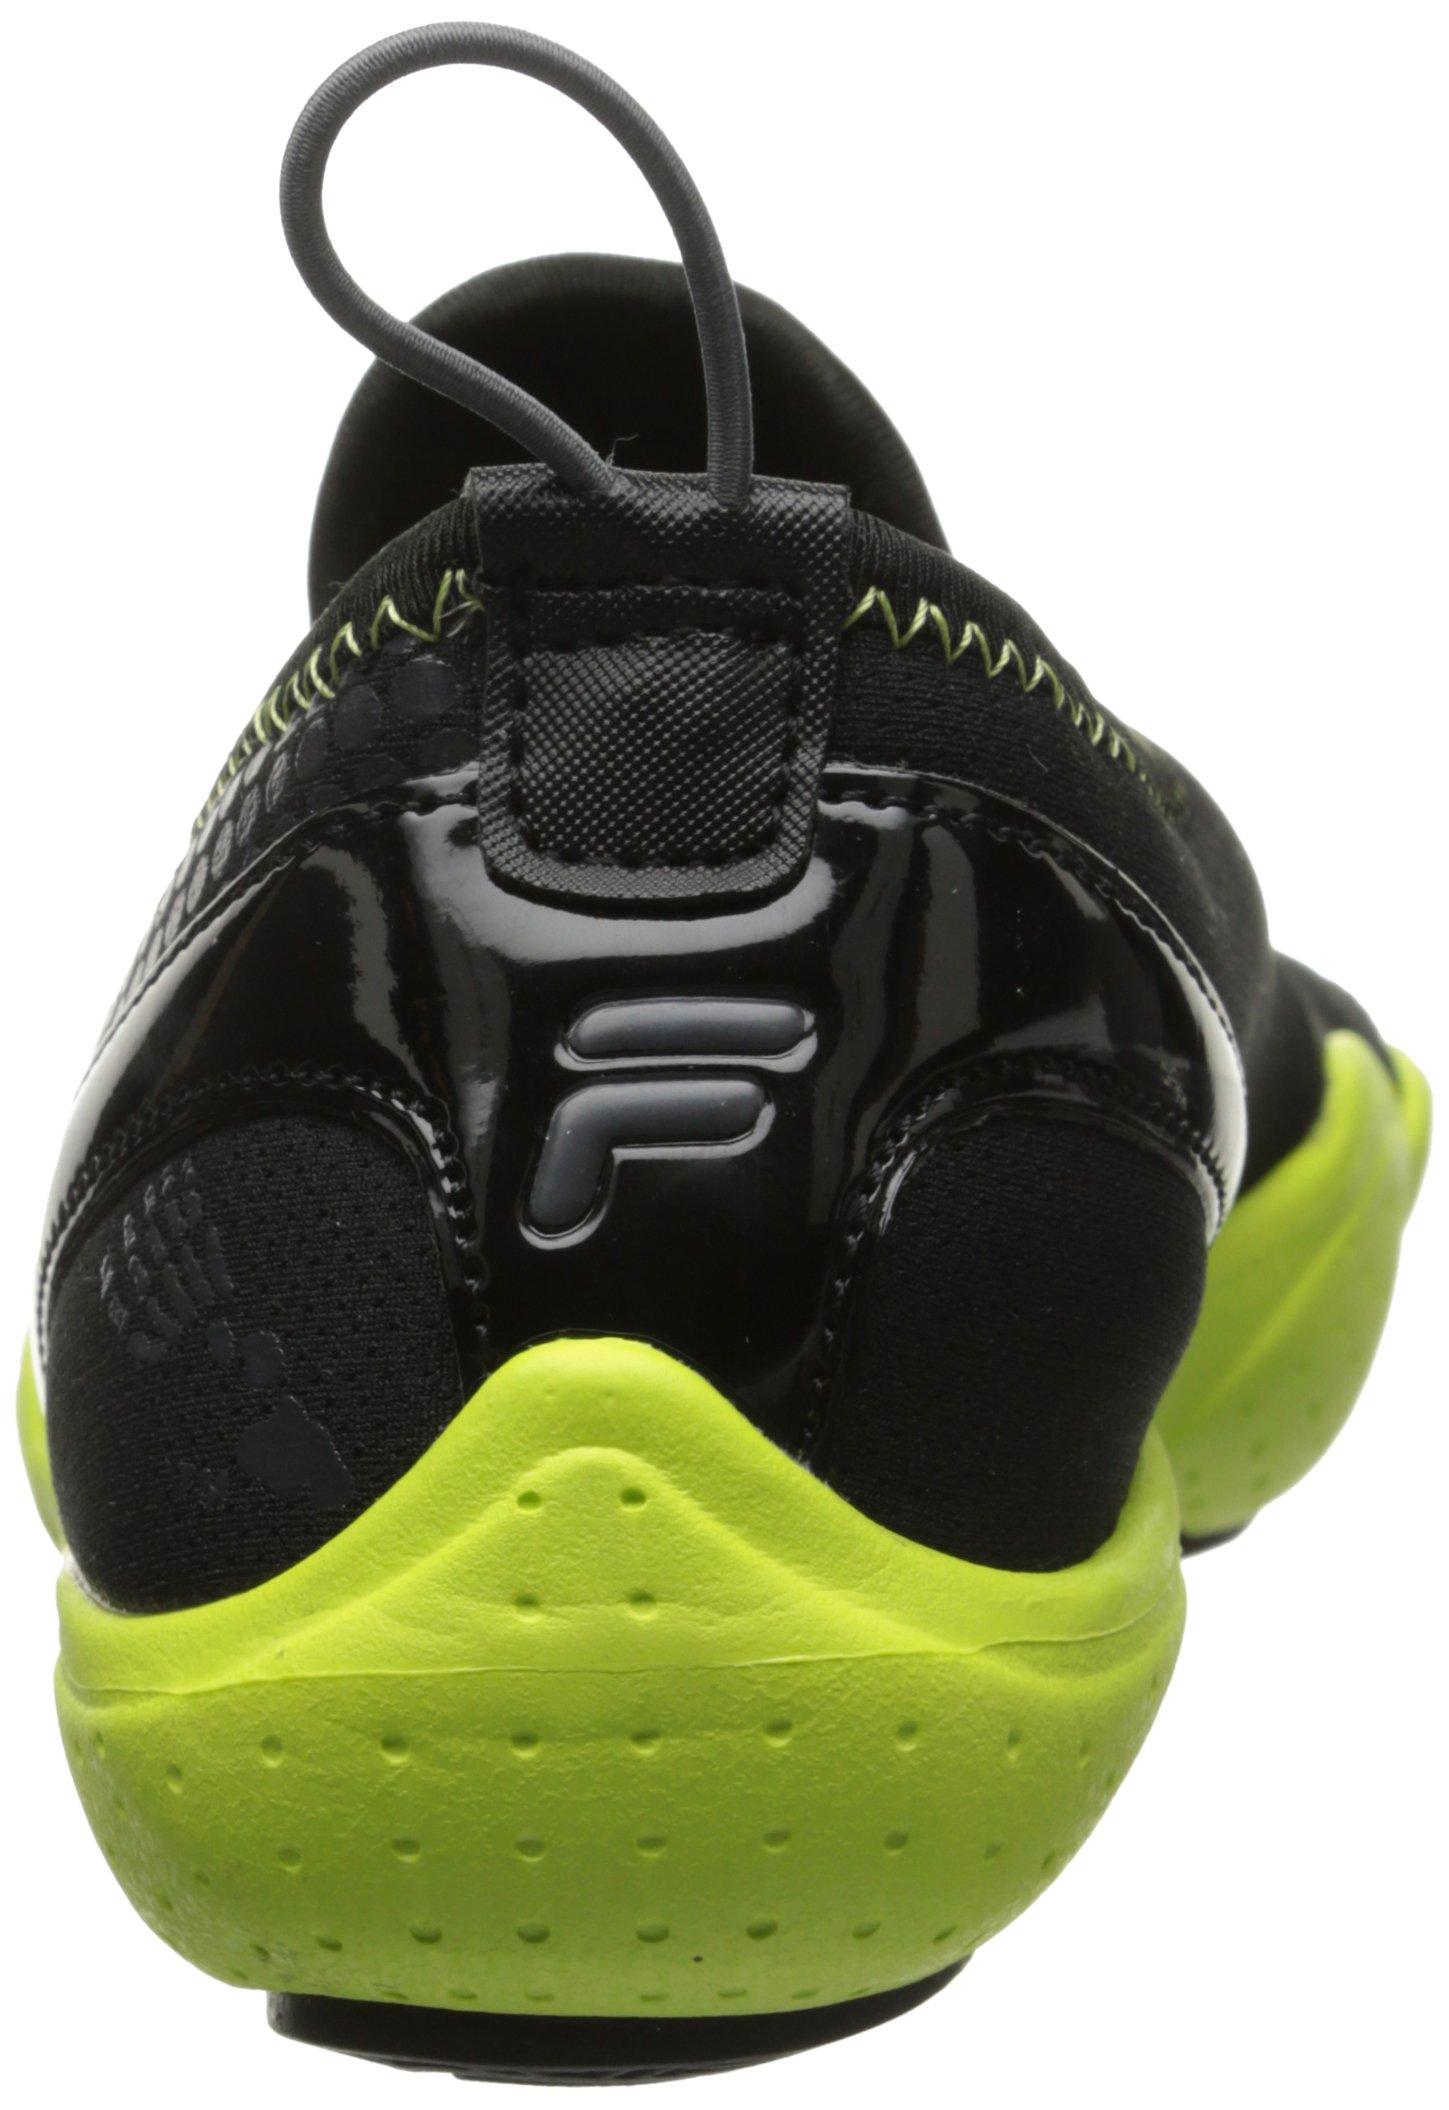 1f6d1d45cff295 Galleon - Fila Men's Skele-Toes Emergence Sneakers,Black,9 M